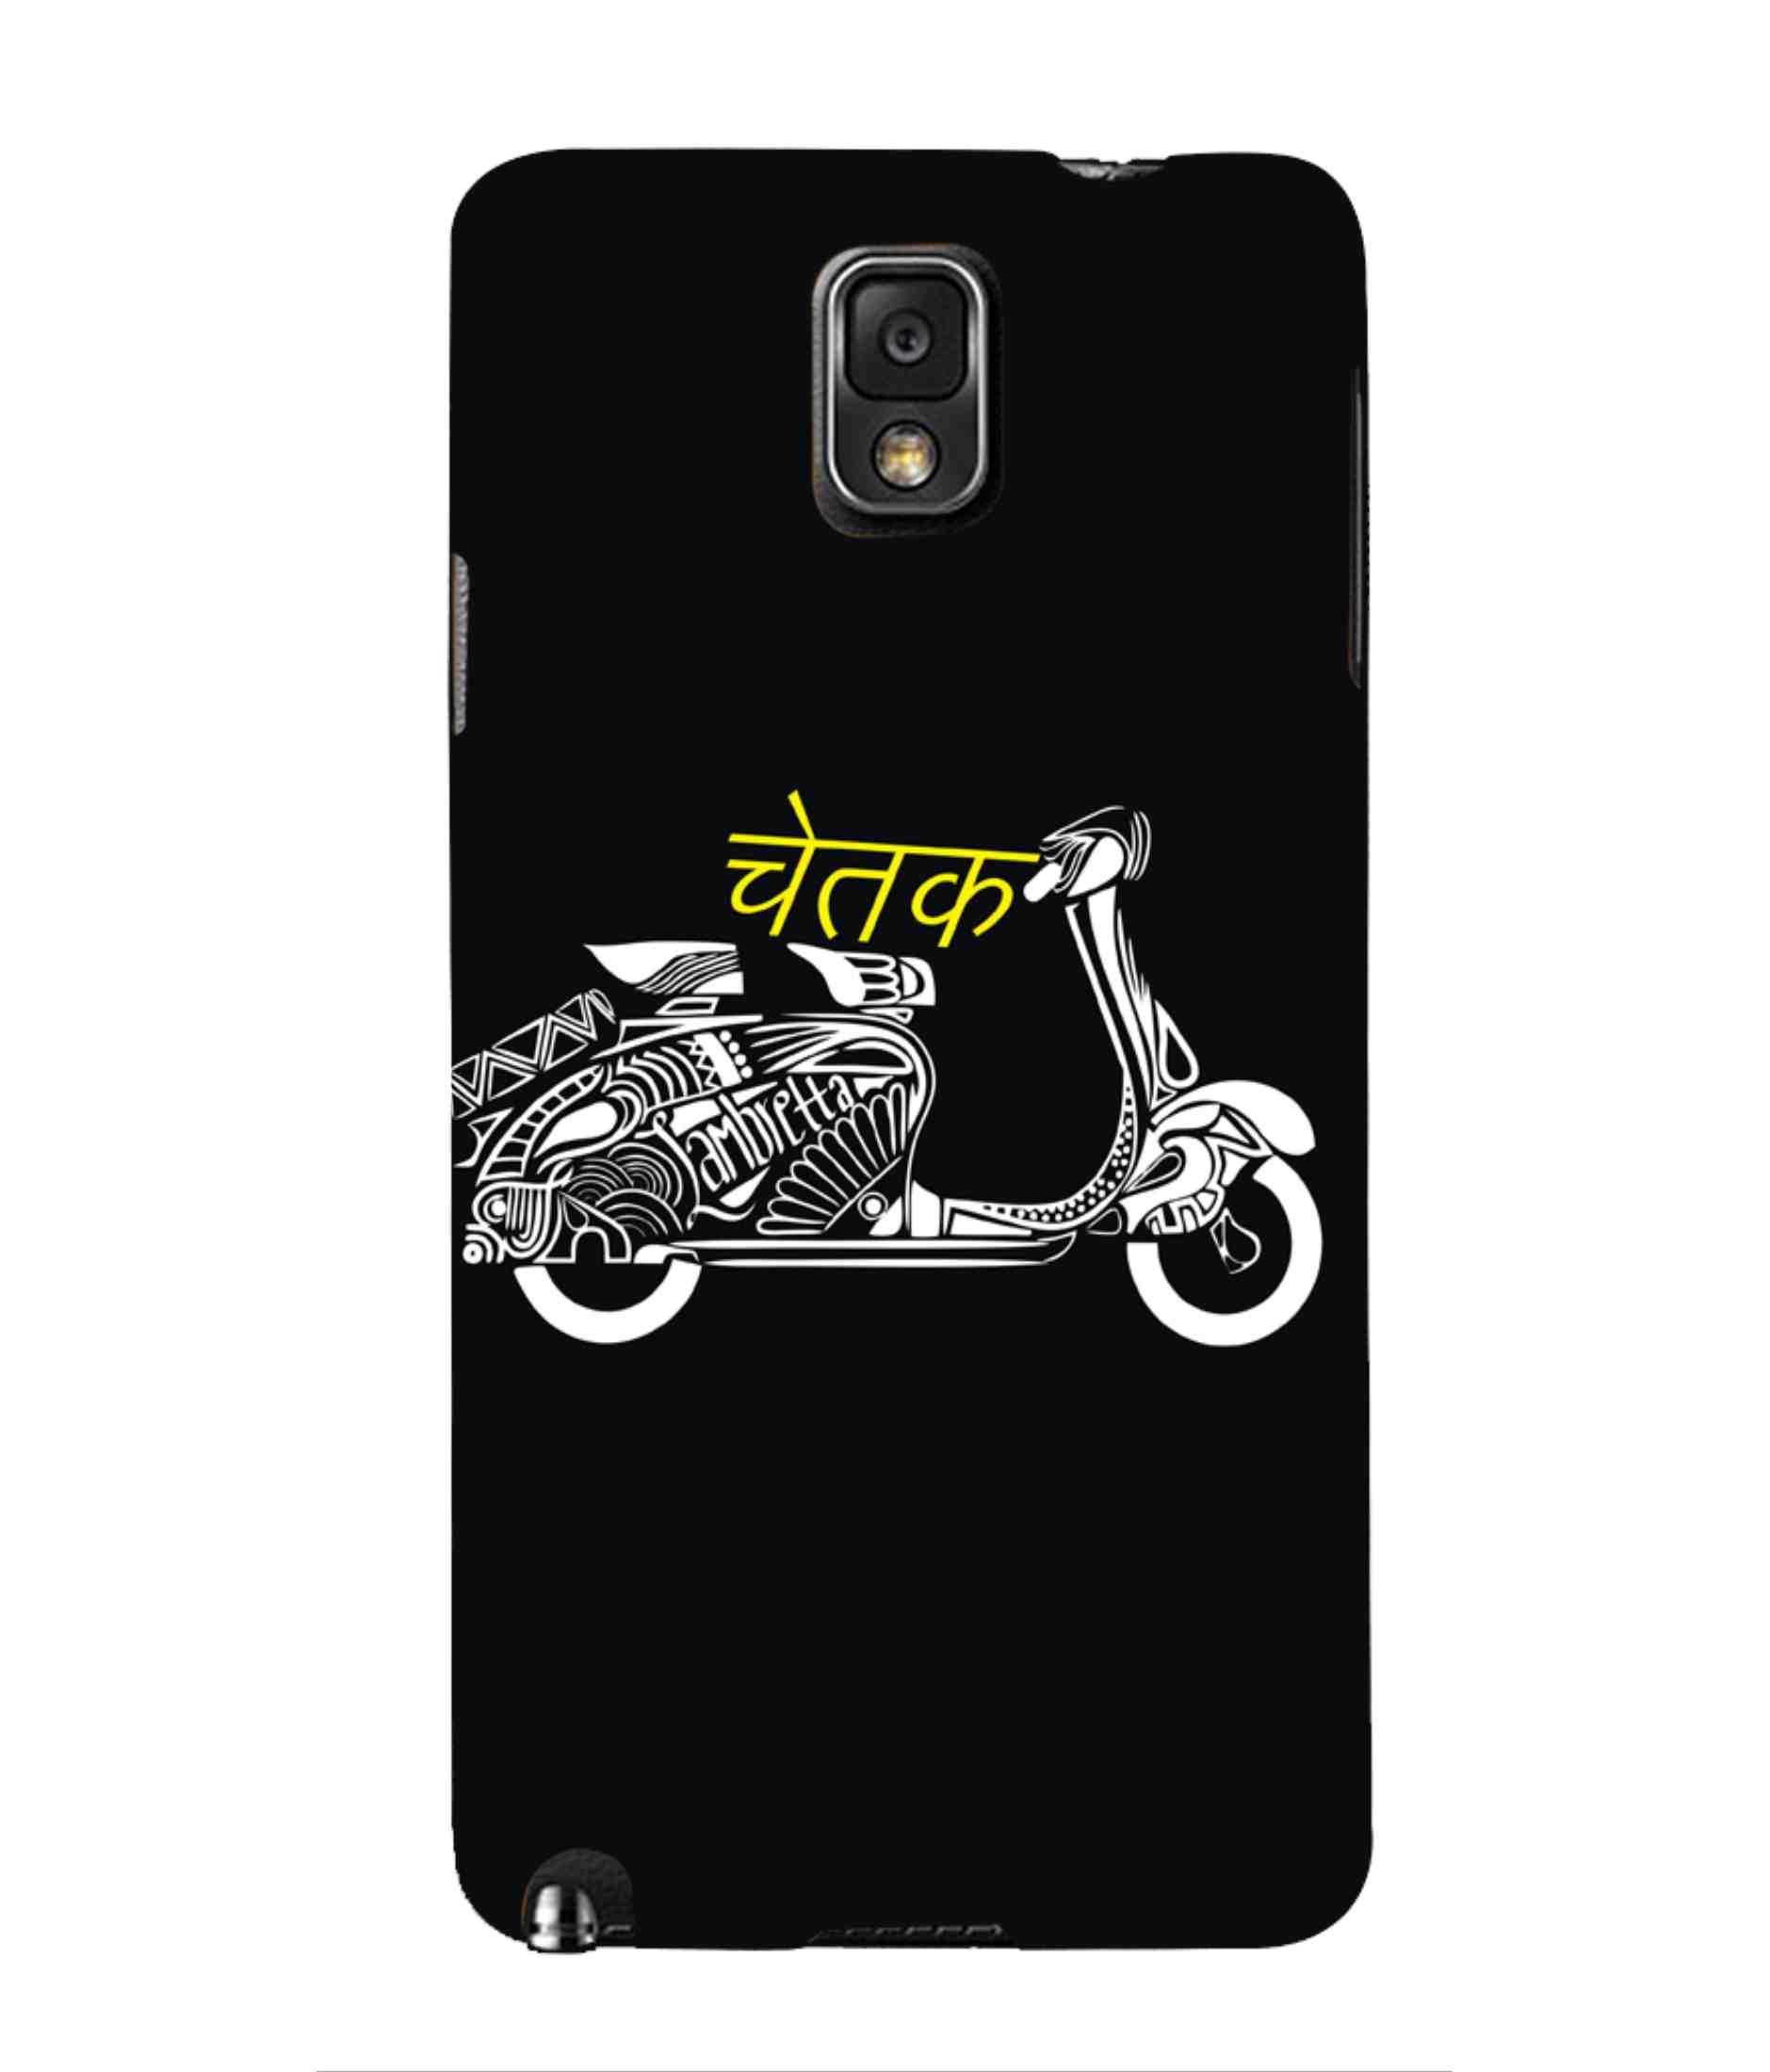 Vibrante Mobile Case Cover For Samsung Galaxy Note 3 , Samsung Galaxy Note Iii , Samsung Galaxy Note 3 N9002 , Samsung Galaxy Note N9000 N9005 28889